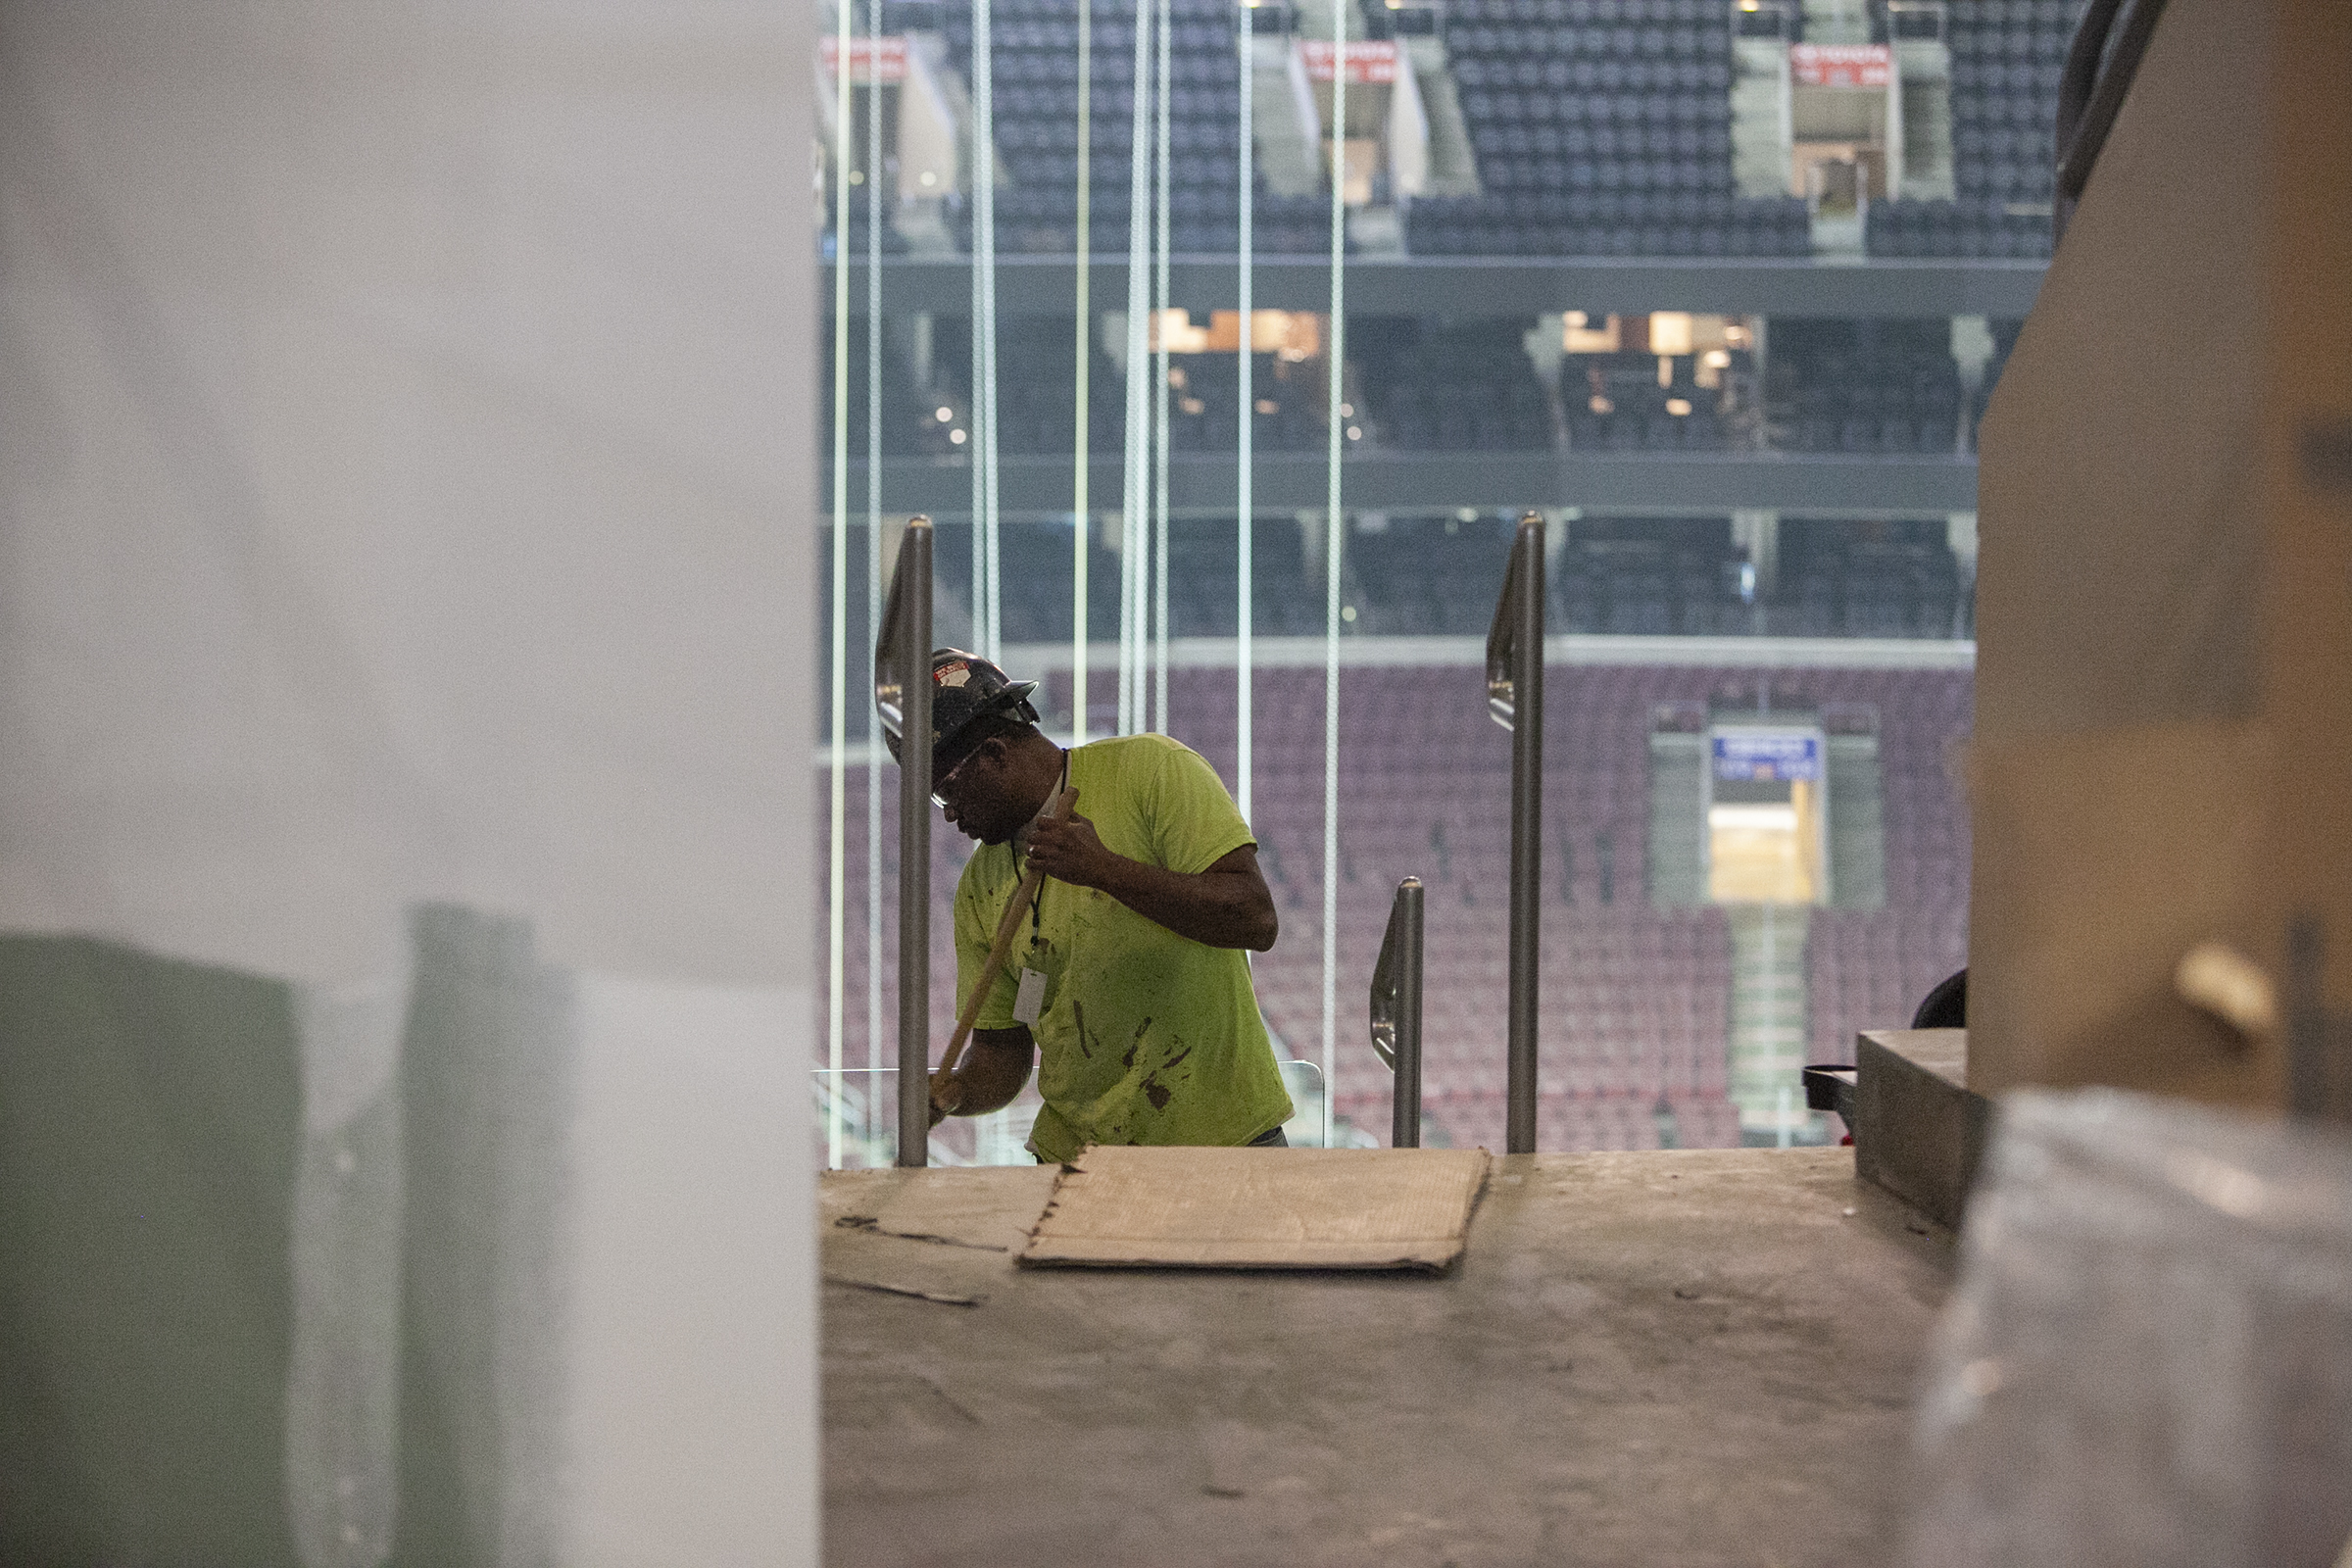 Construction crews work on the renovations inside the Wells Fargo Center on Thursday, Aug. 23, 2018.